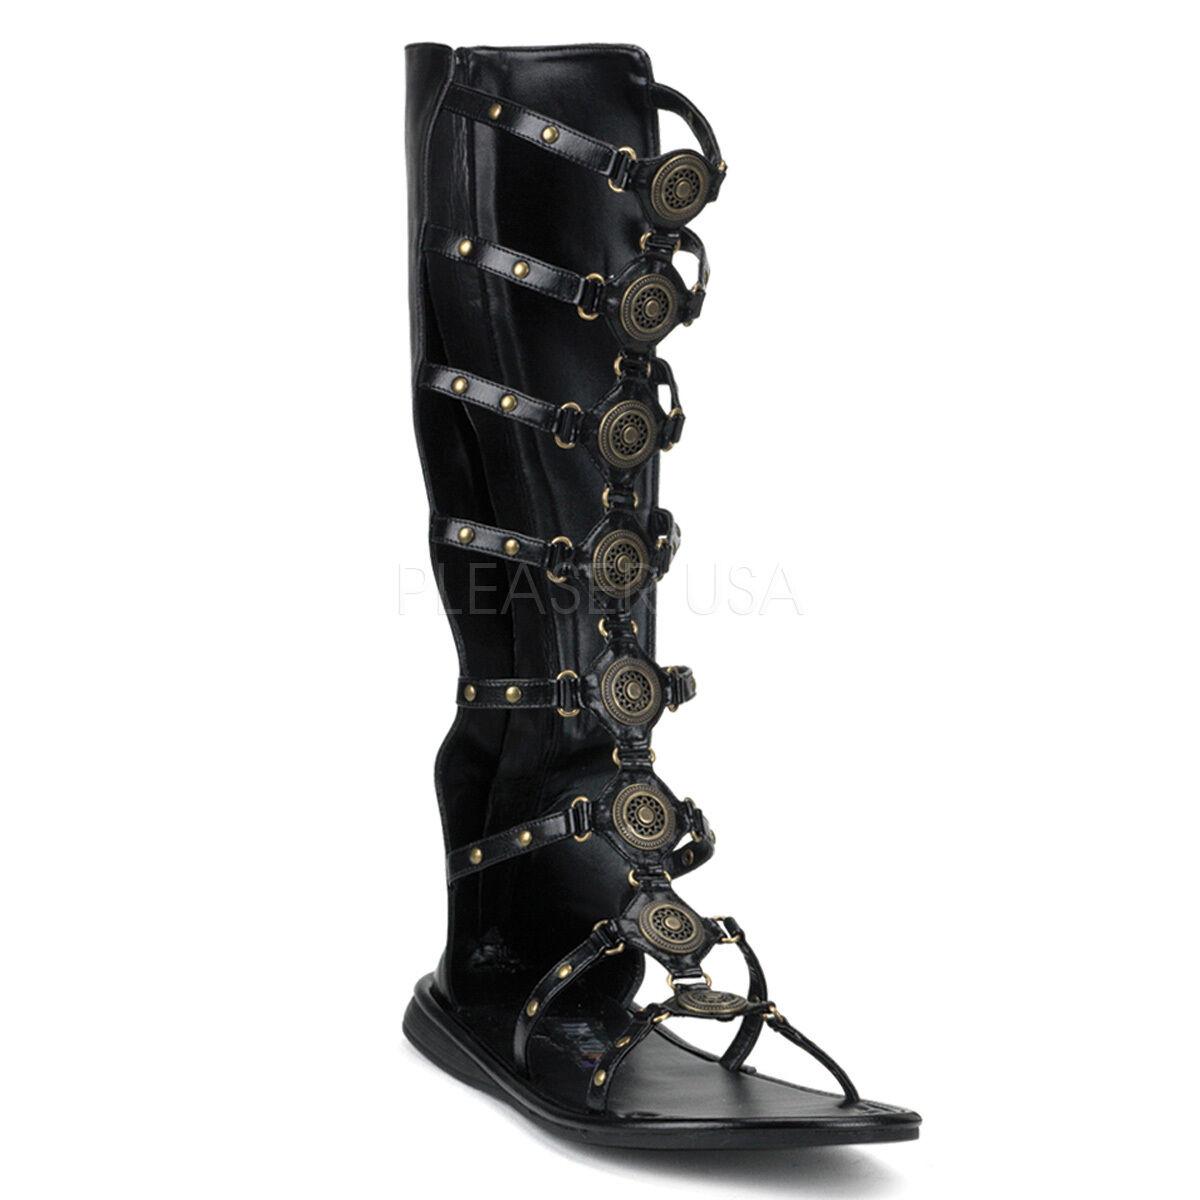 e4cd2168461 Black Roman Soldier Hercules Gladiator Sandals Boots Costume shoes Mens Up  Lace cadrcf1829-Men s Sandals   Beach Shoes